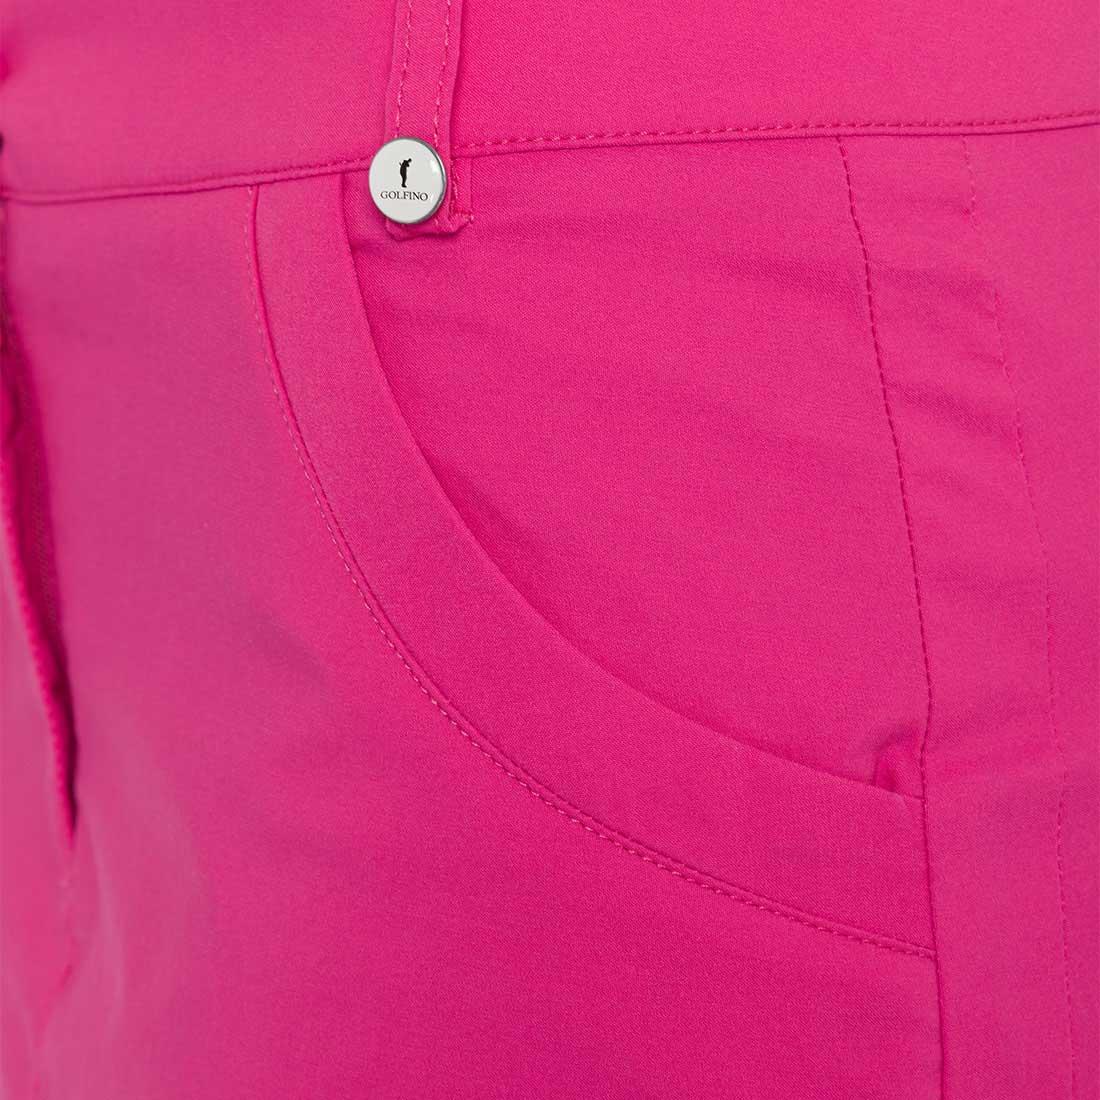 Sofiguard Damen Medium Golfskort aus Techno-Stretch mit Sun Protection